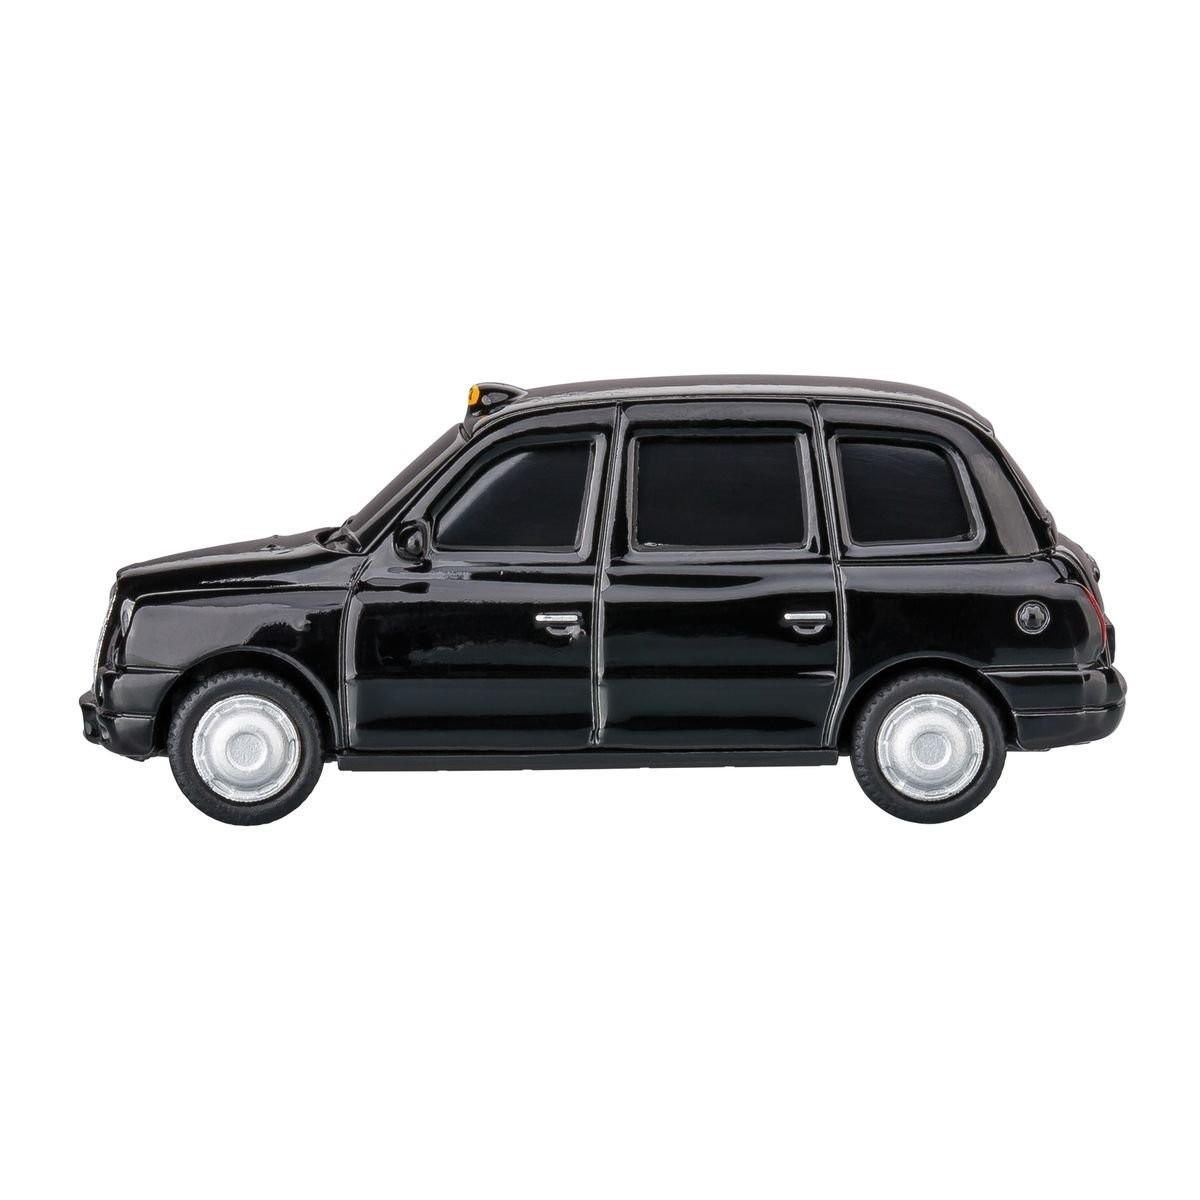 USB flash drive London Taxi TX4 1:72 BLACK 16GB, View 2